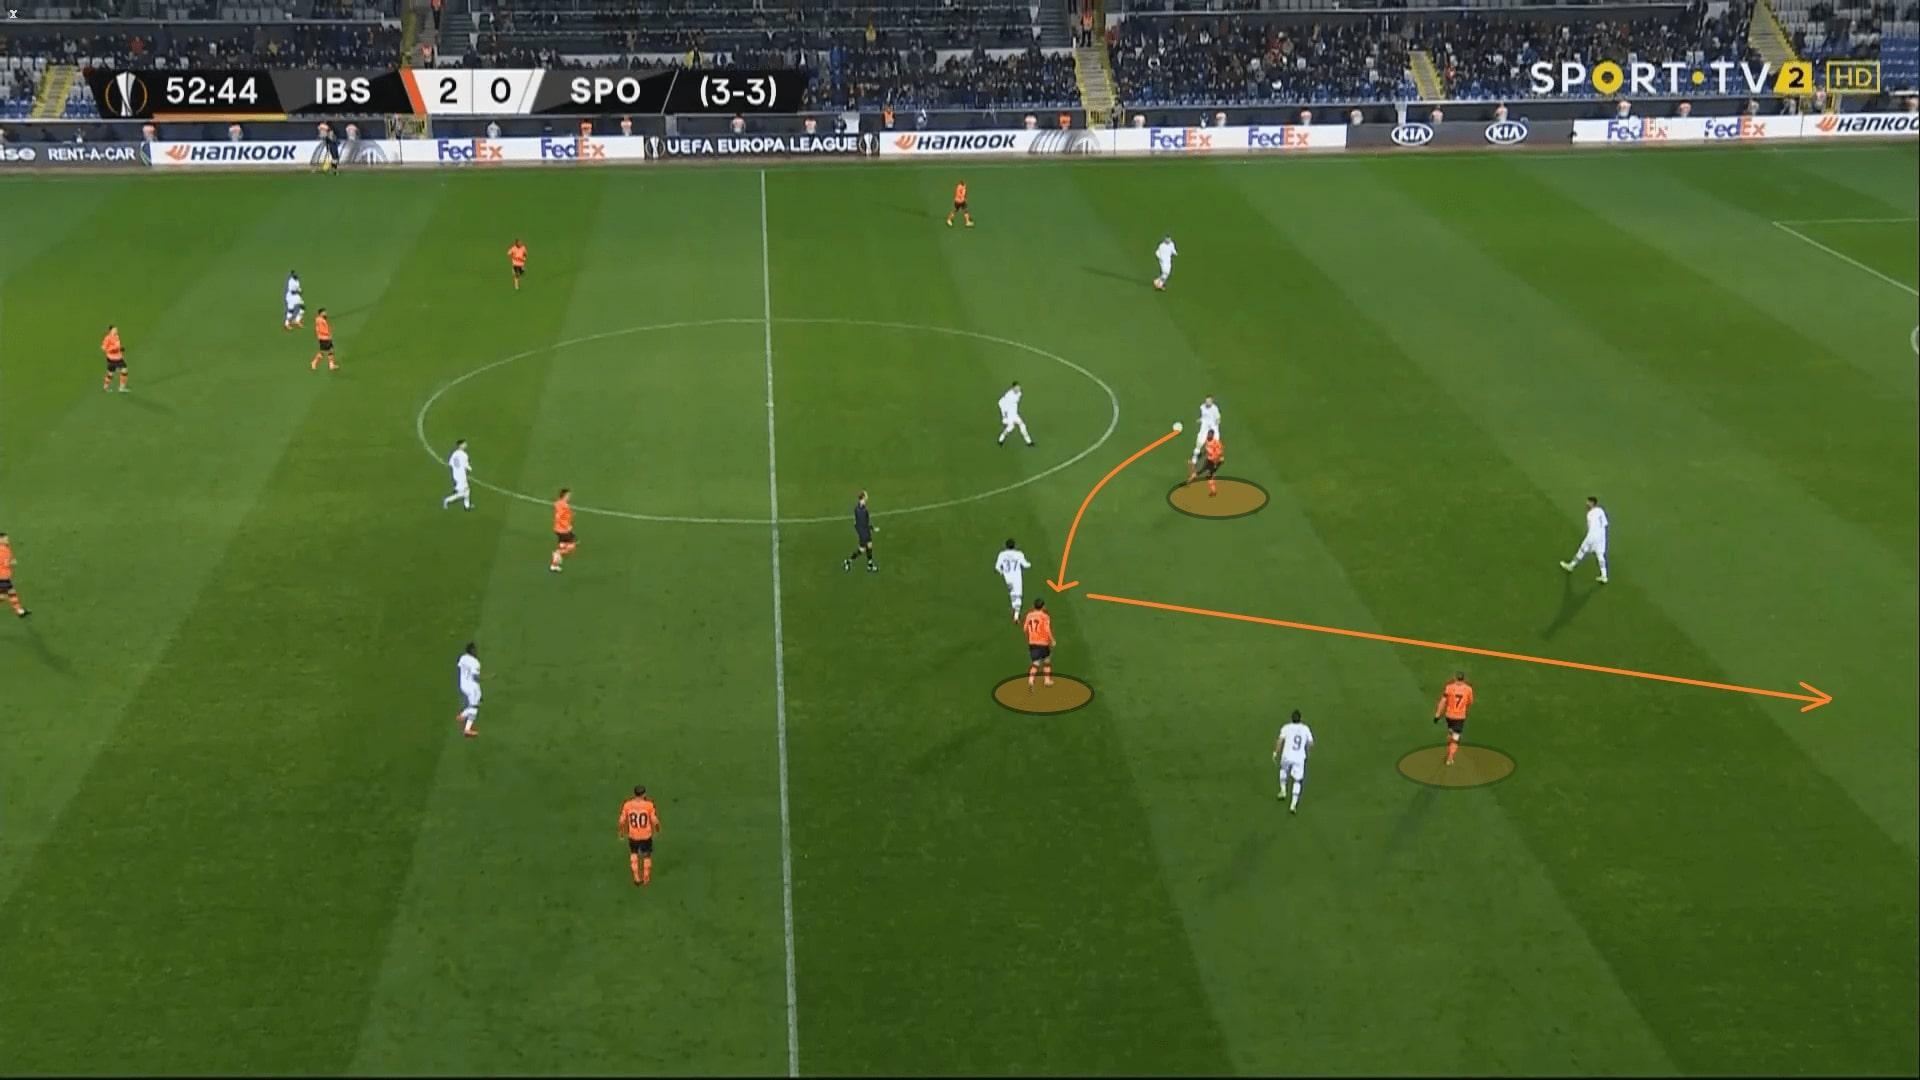 Istanbul Basaksehir: Their offensive style of play under Okan Buruk - tactical analysis tactics